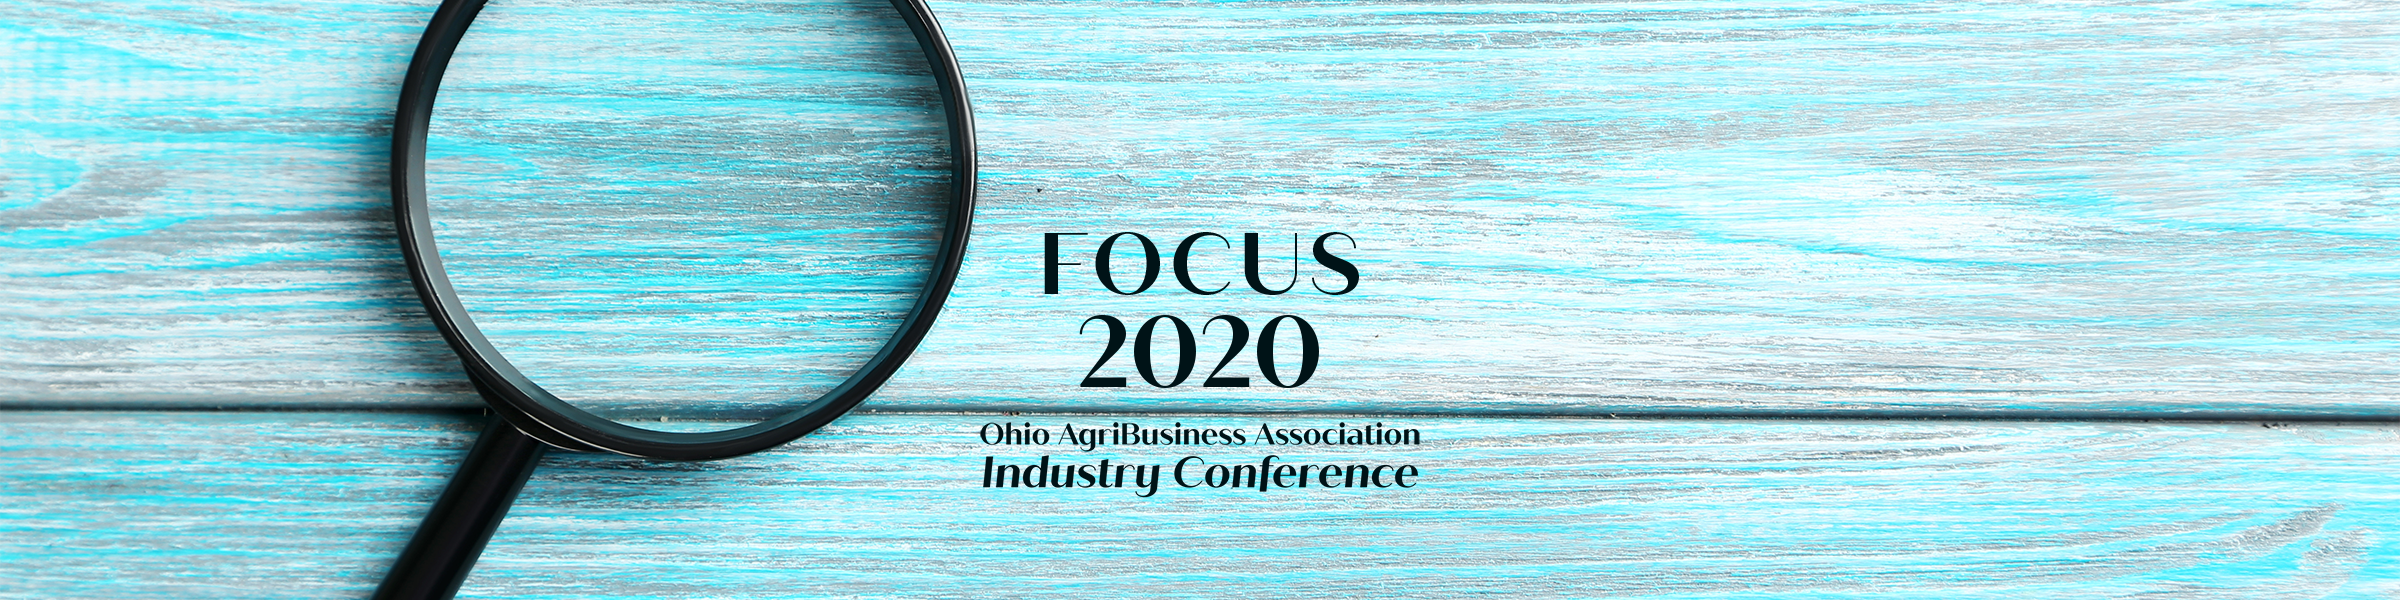 Focus2020 Conference Header